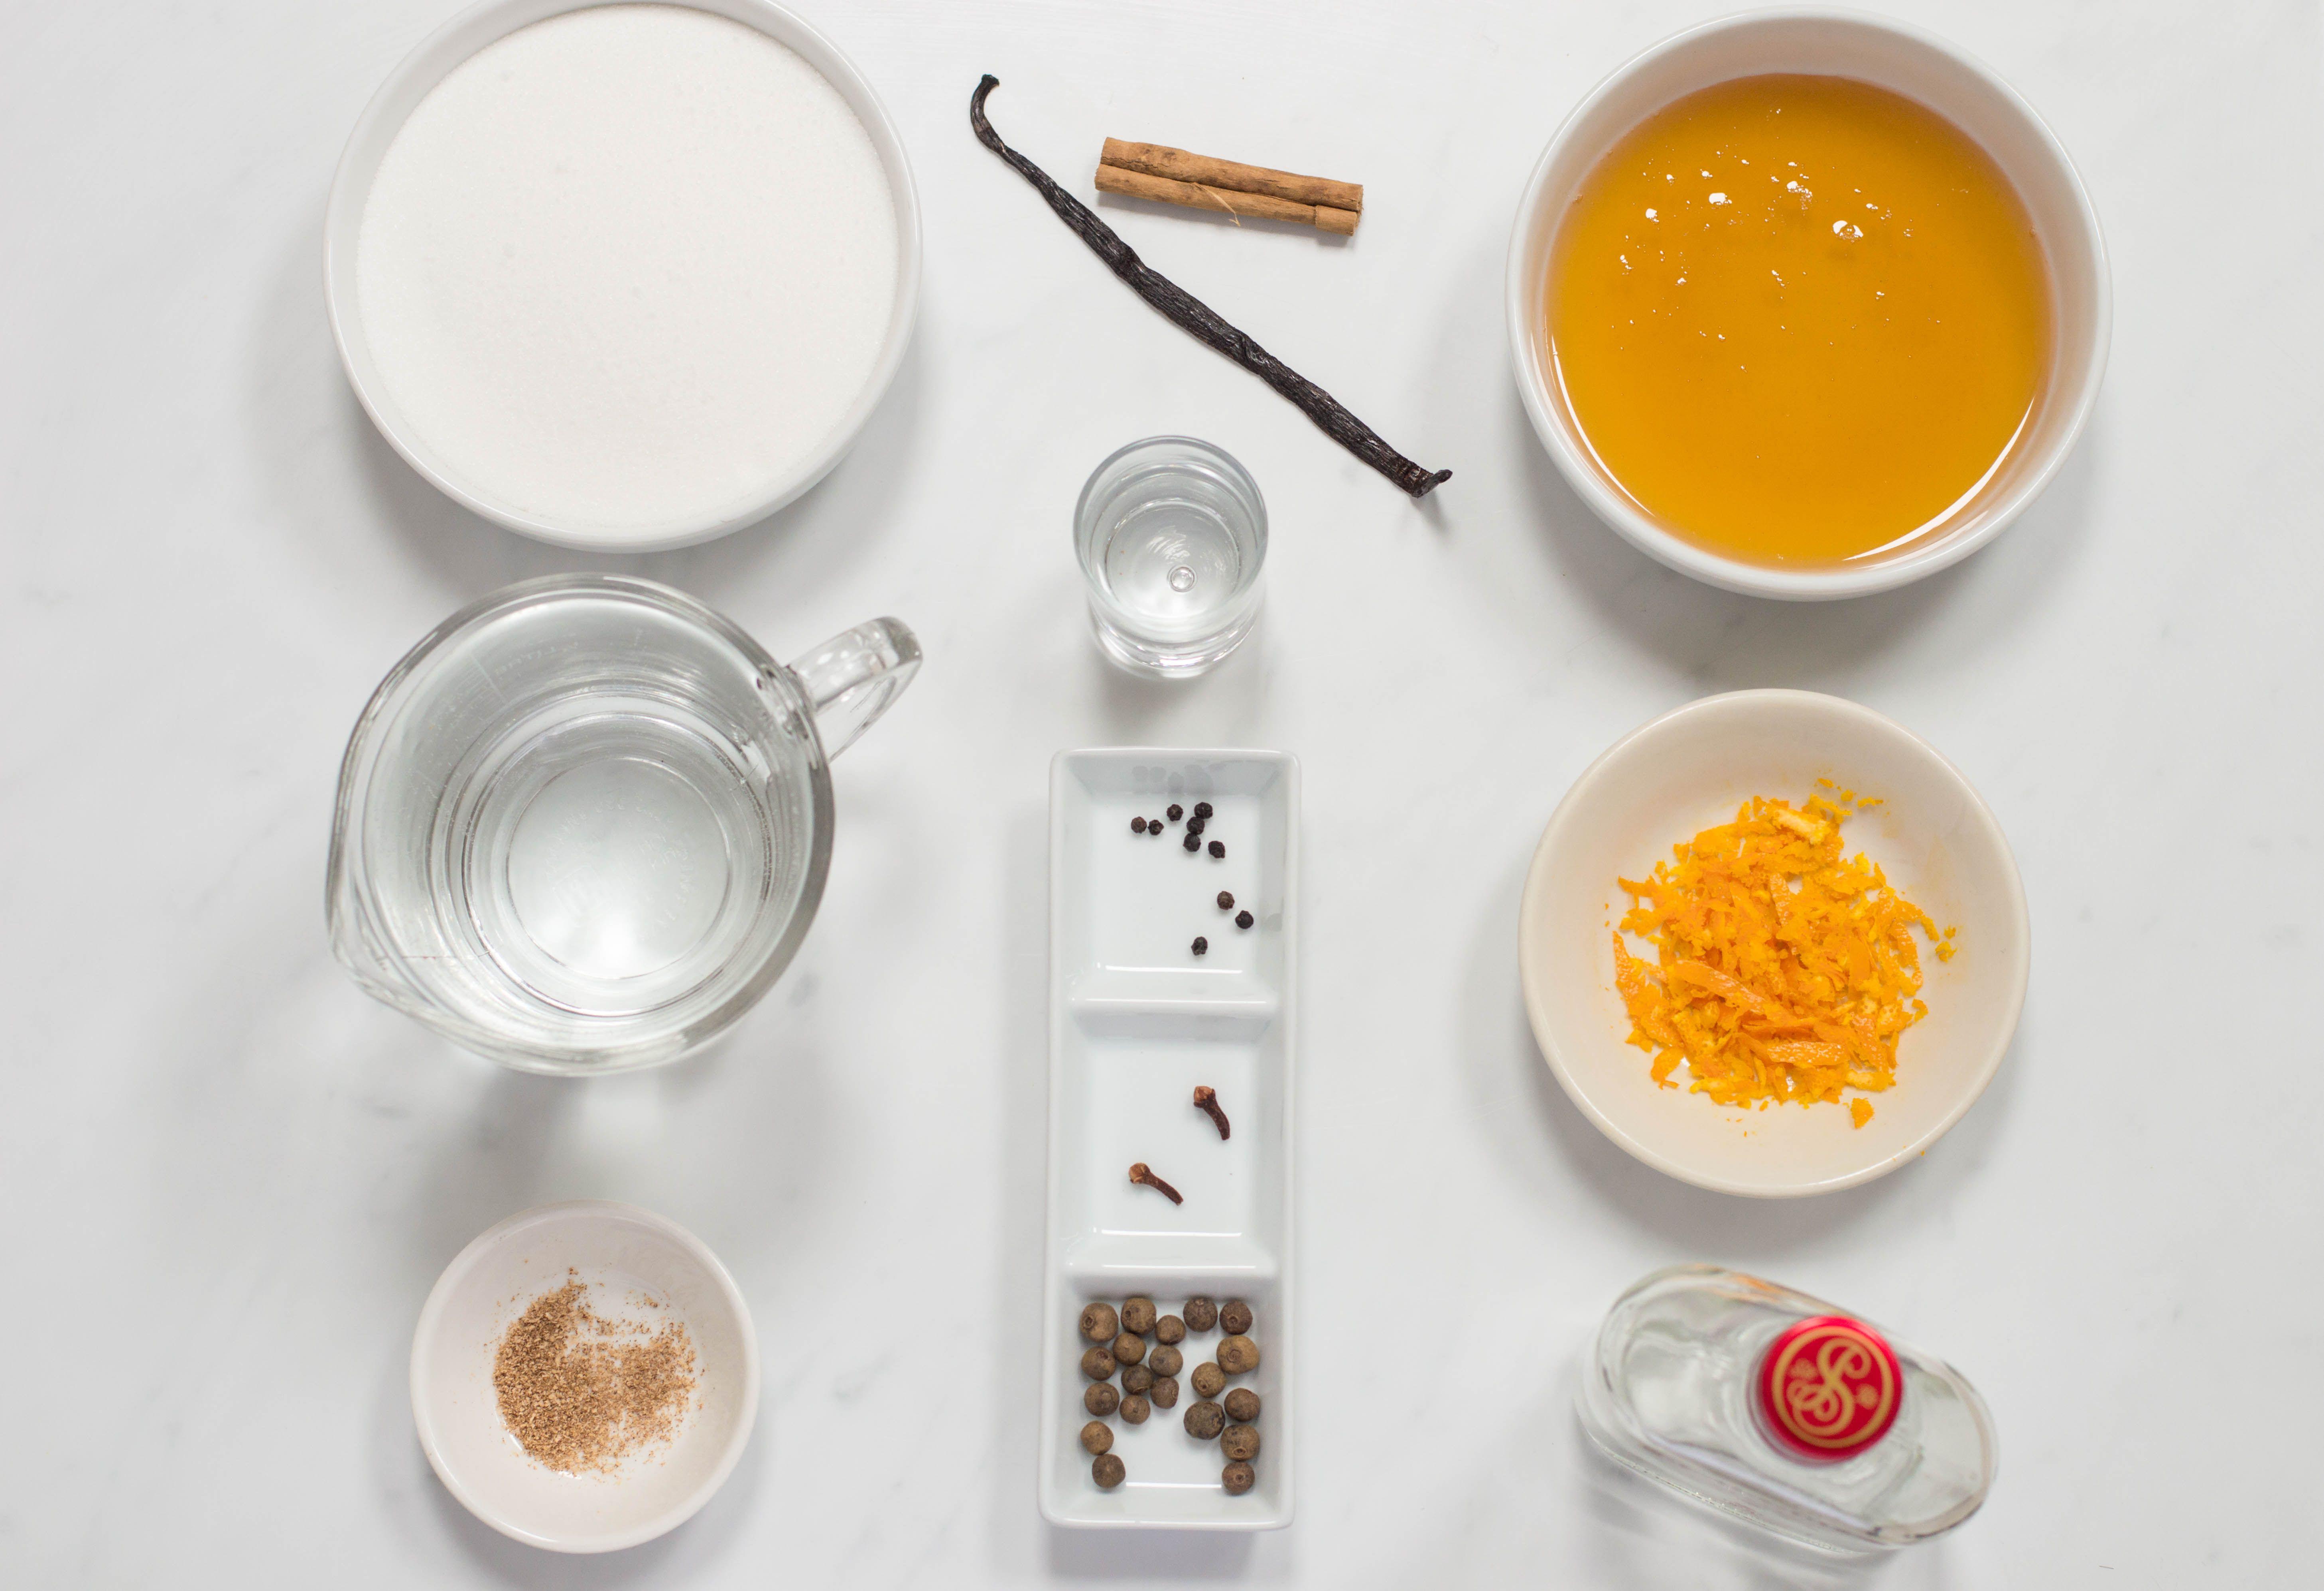 Ingredients for honey-spiced vodka